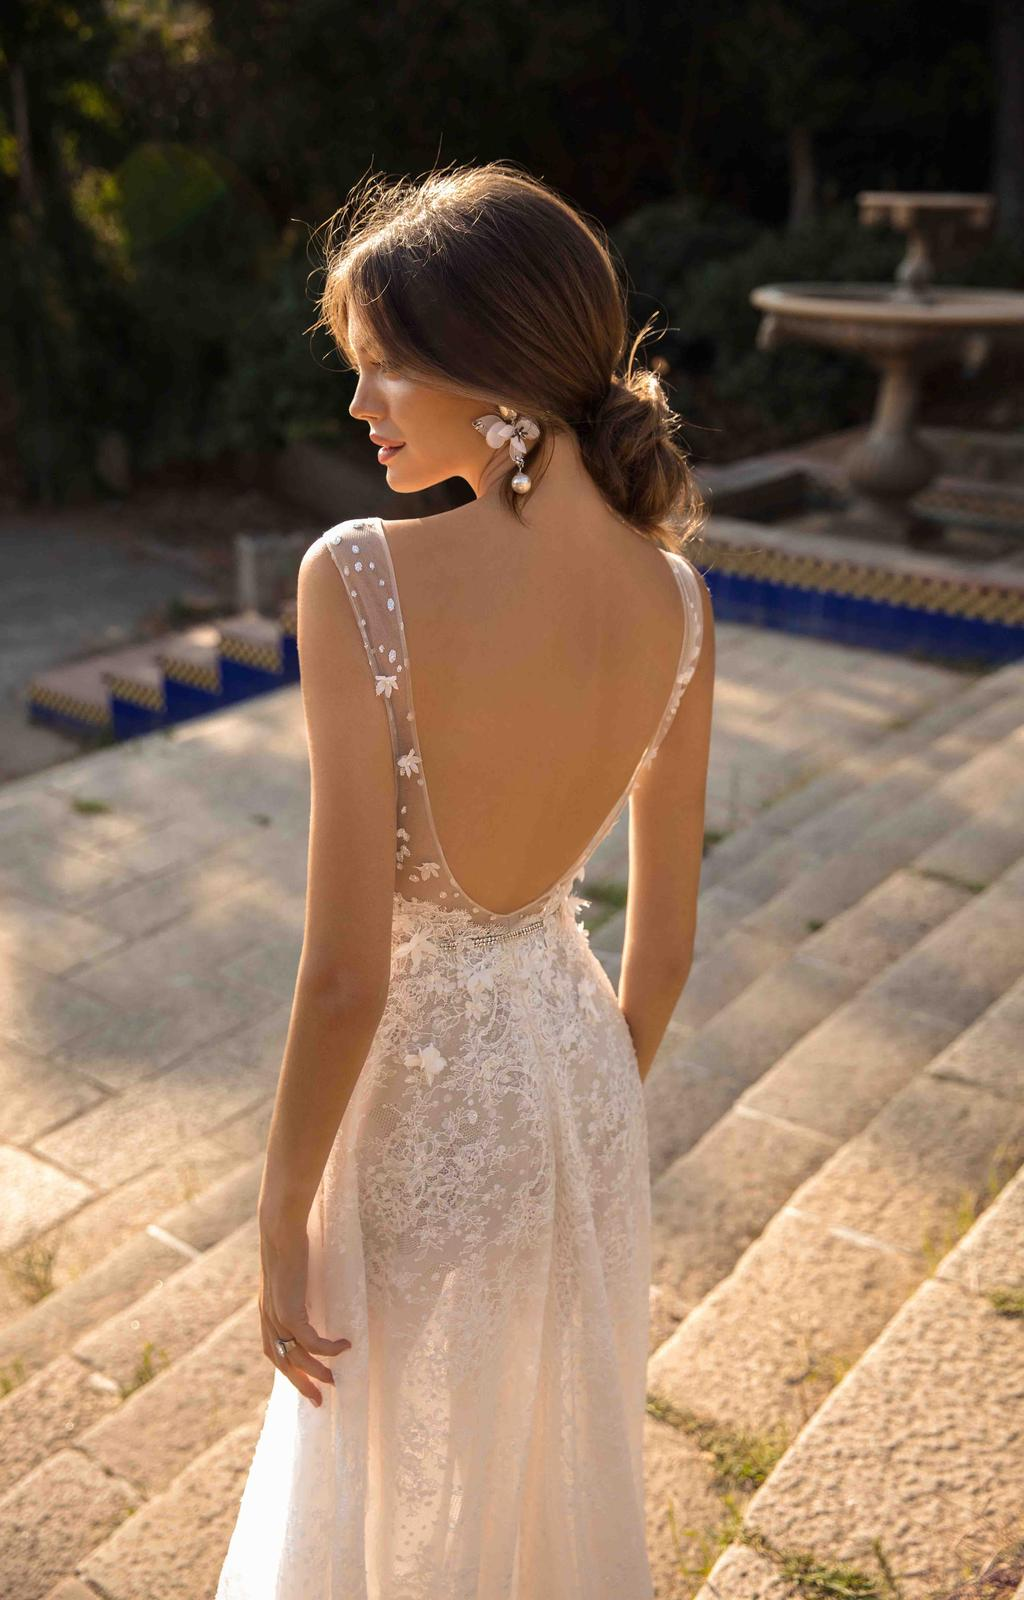 Muse by Berta * Svadobné šaty z kolekcií na rok 2019 - Obrázok č. 6